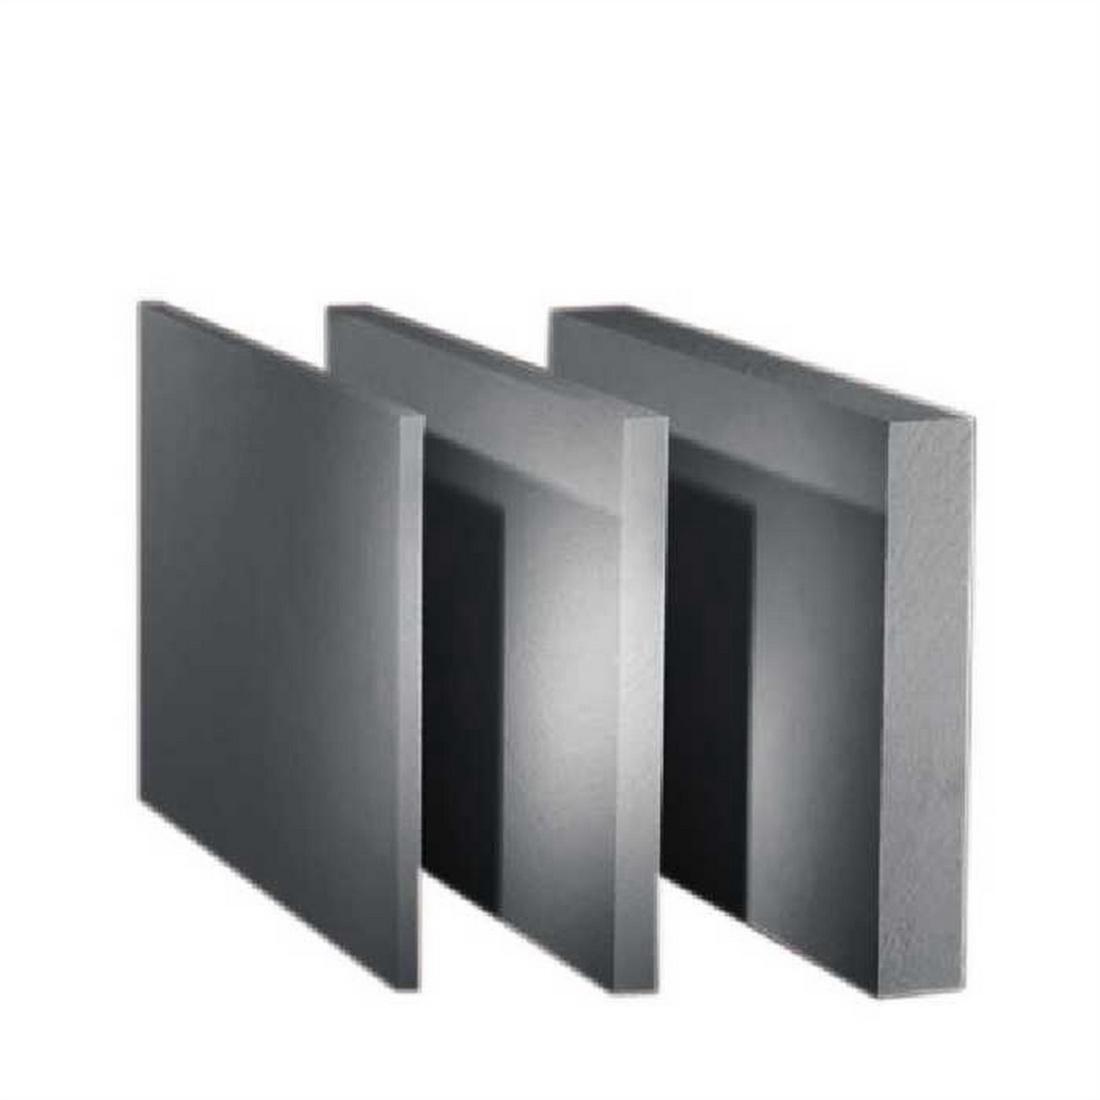 Expol Platinum Board 2400 x 1200 x 75mm R2.34 Black Expanded Polystyrene N2475